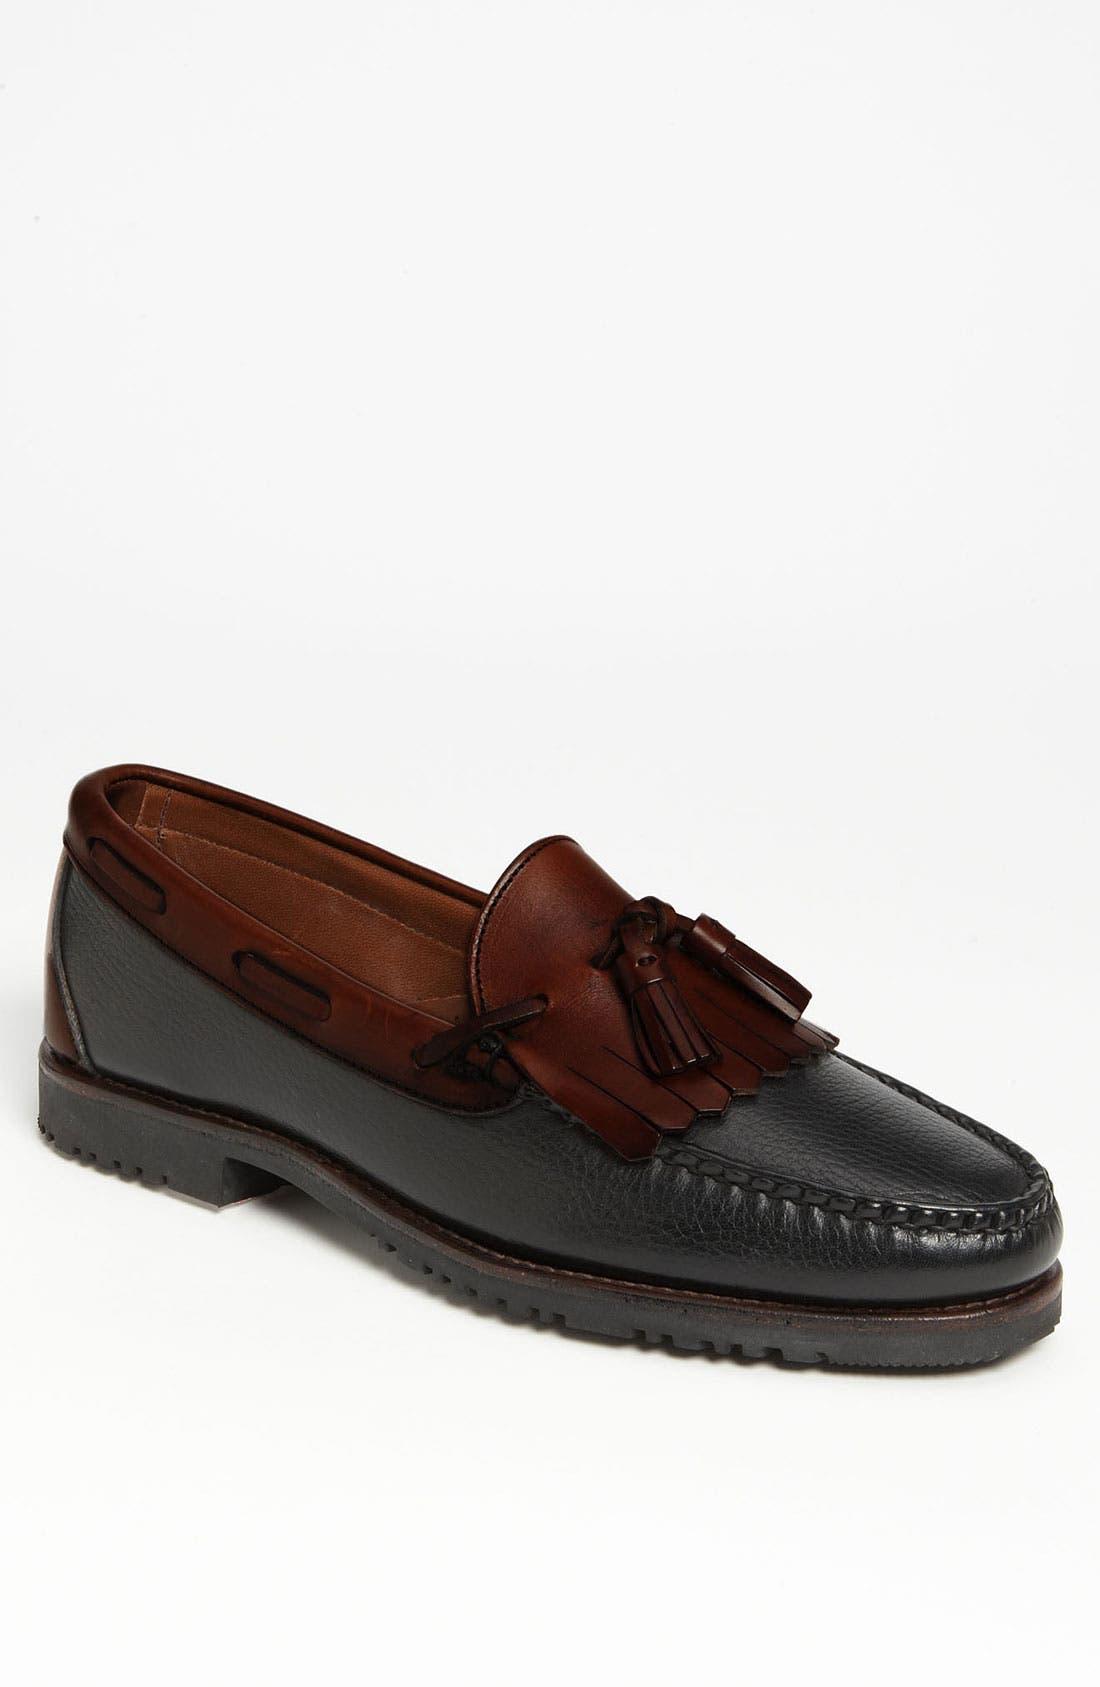 'Nashua' Tassel Loafer,                             Main thumbnail 1, color,                             BLACK/ BROWN